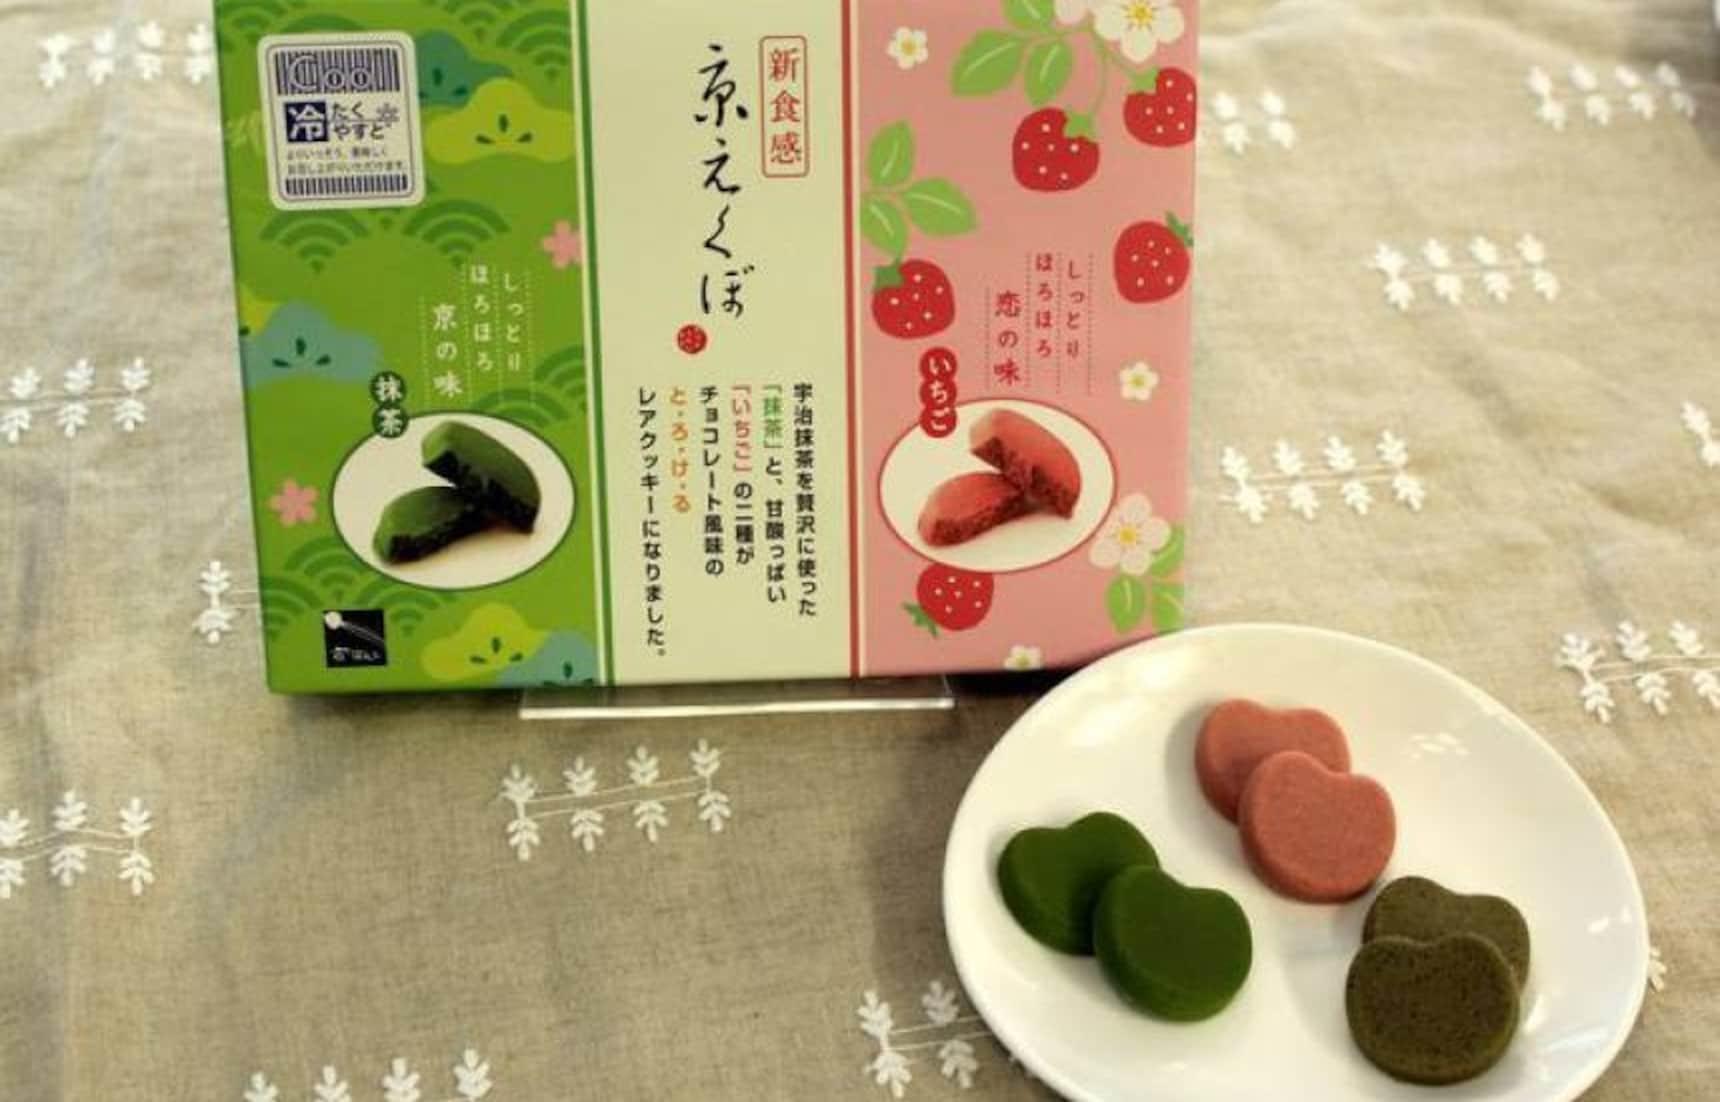 Kyoto's Spectacular Matcha Green Tea Souvenirs